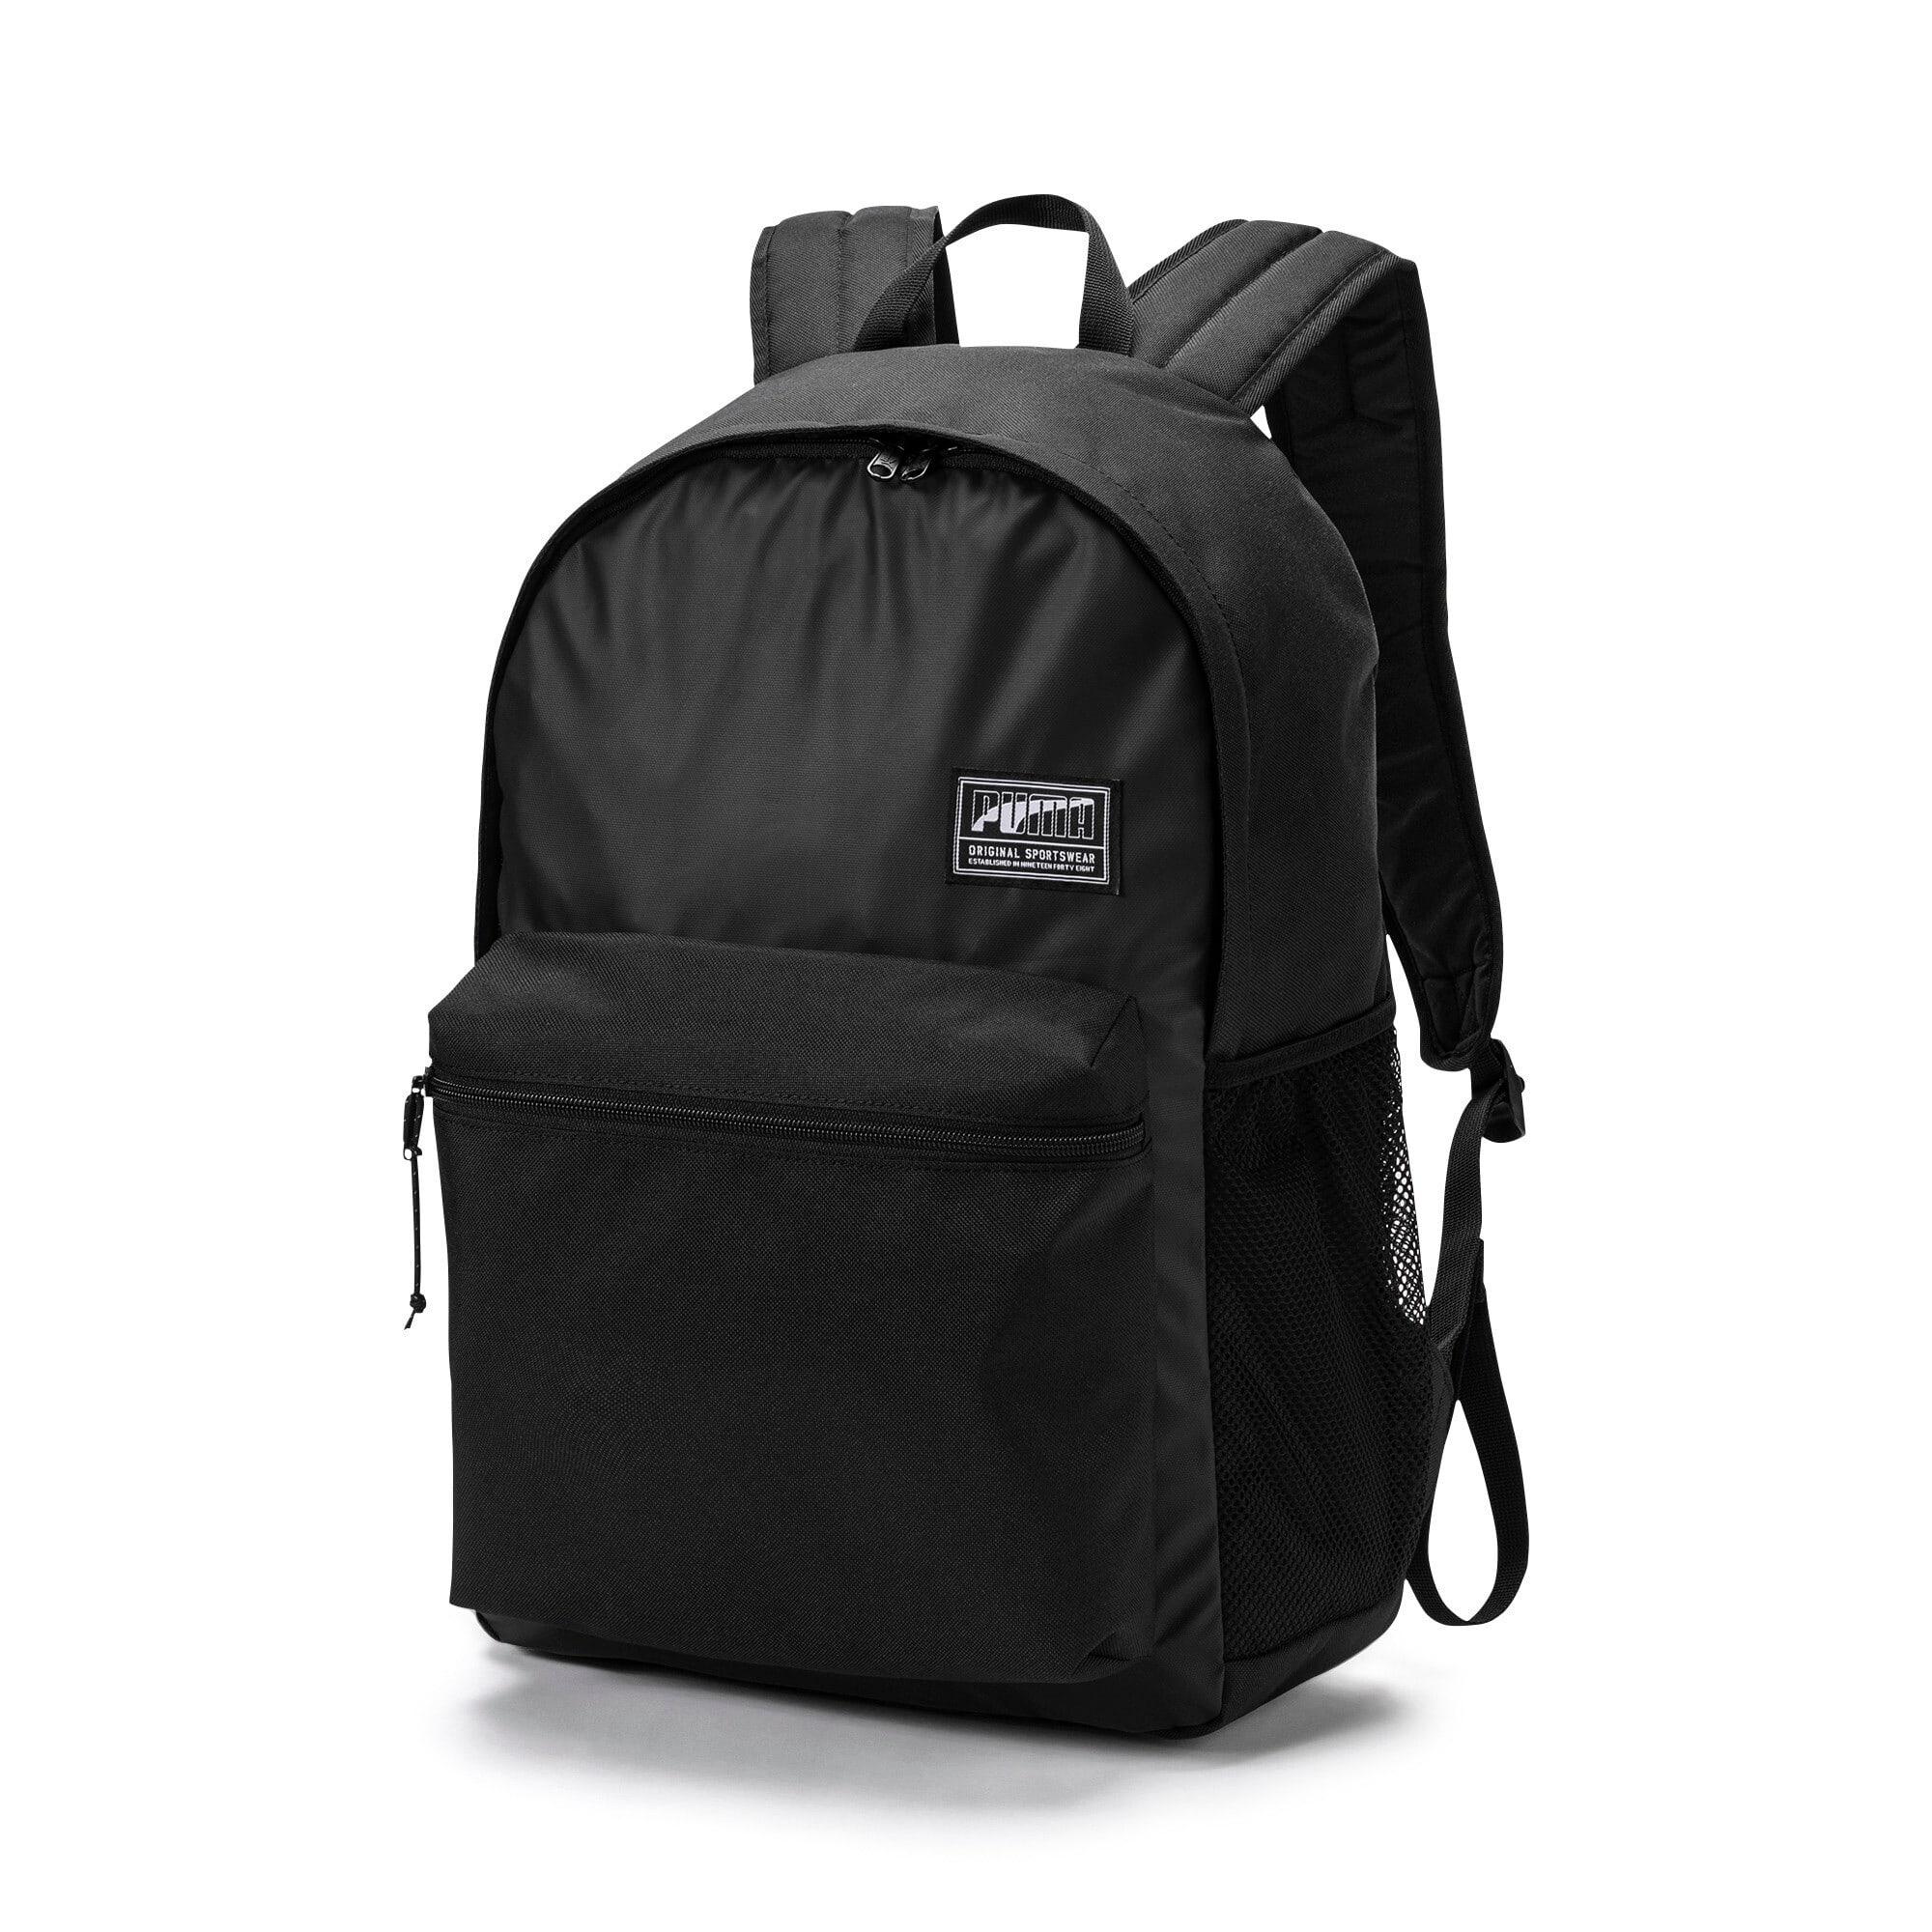 Thumbnail 1 of Academy Backpack, Puma Black, medium